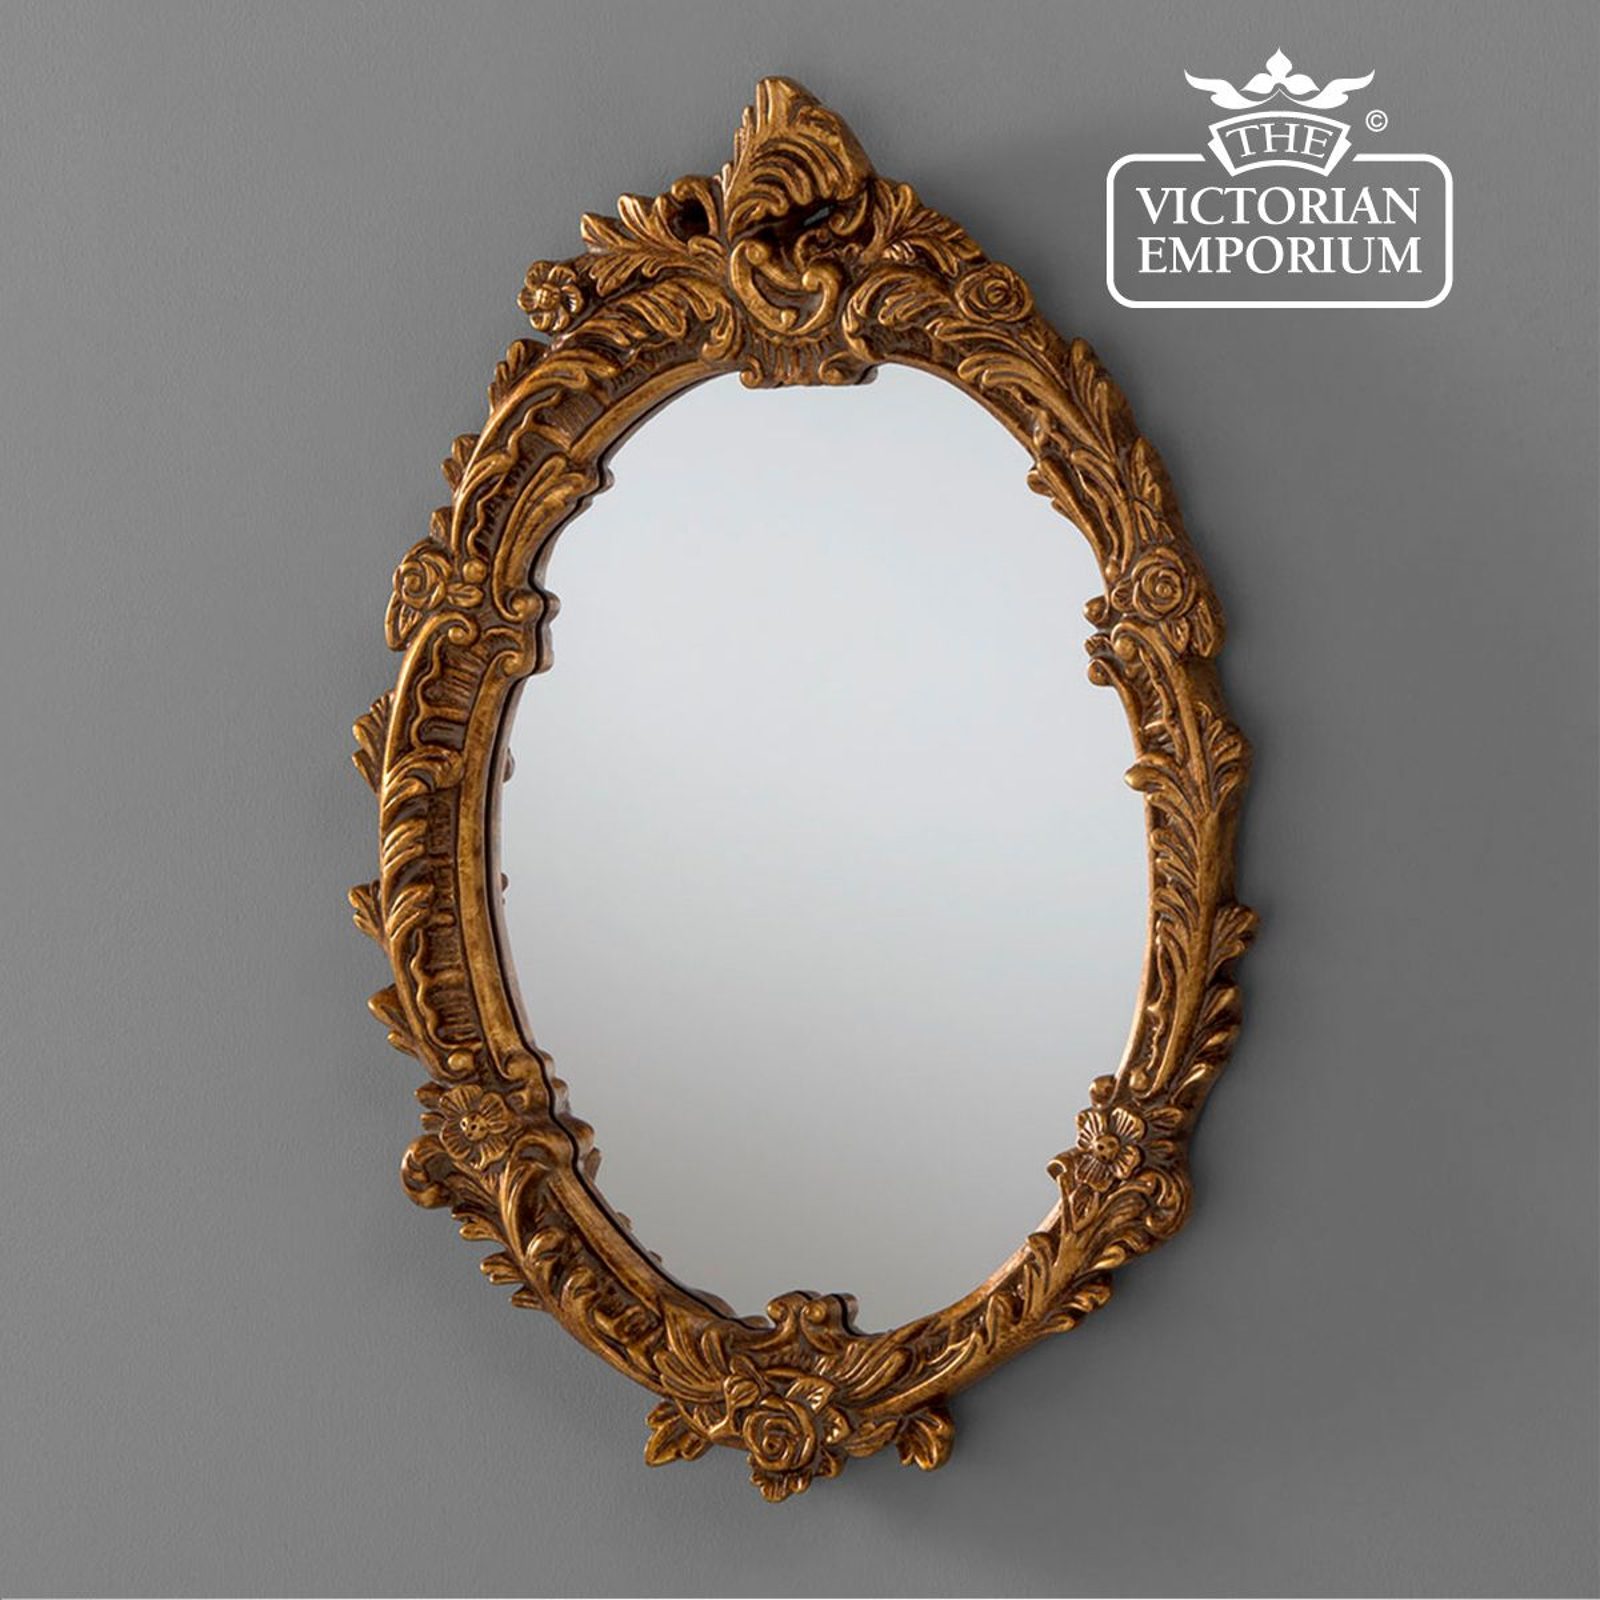 Gold Framed Oval Decorative Mirror 64x46cm